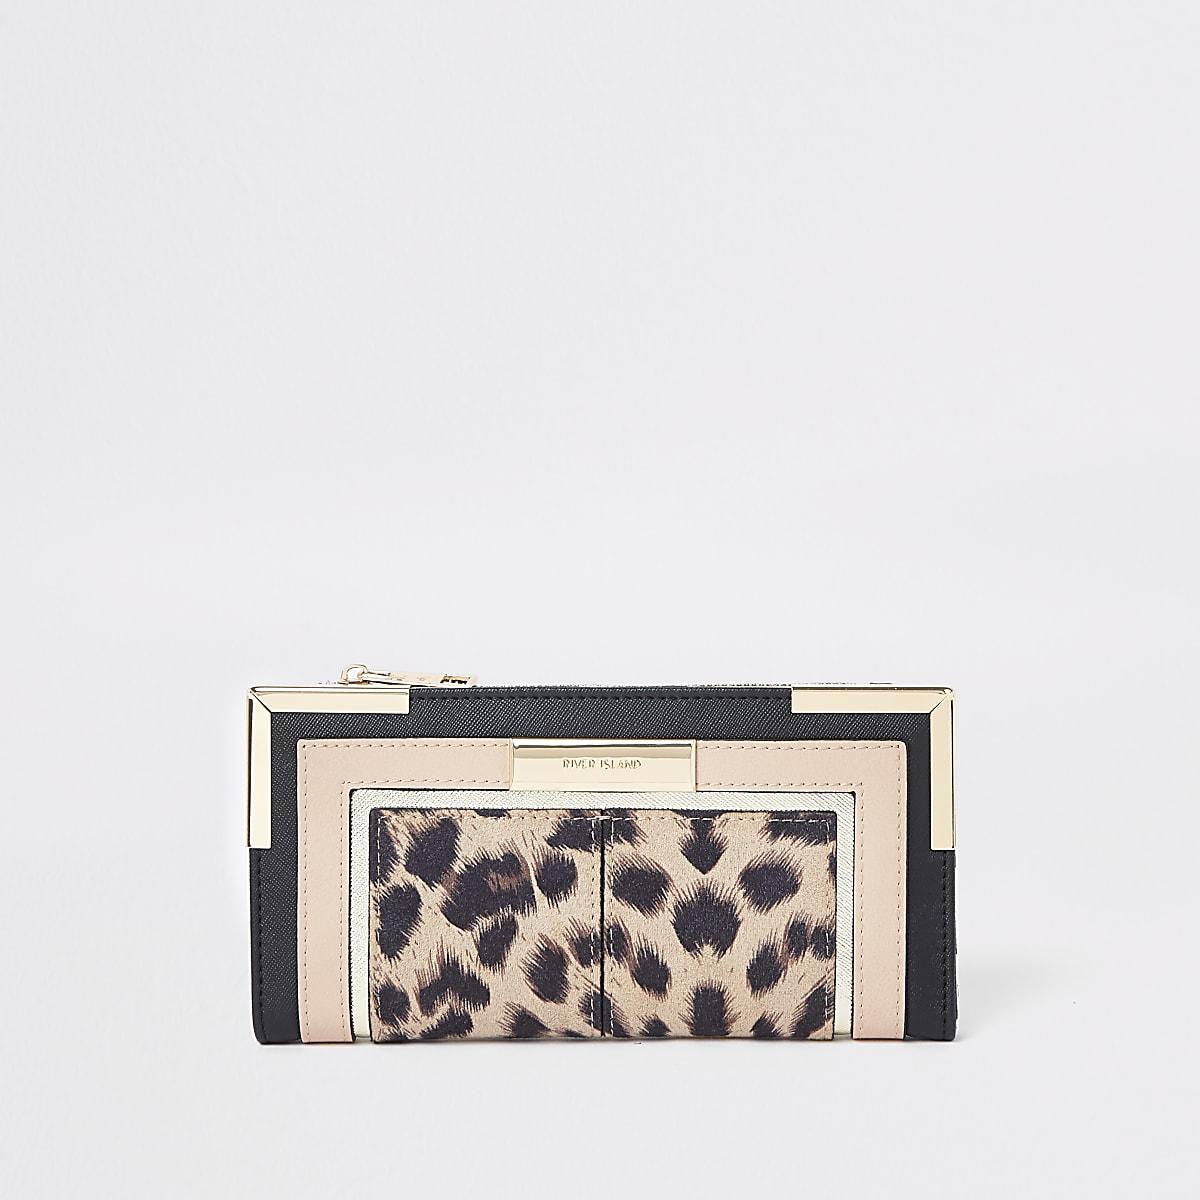 Beige uitvouwbare portemonnee met luipaardprint en uitsnede